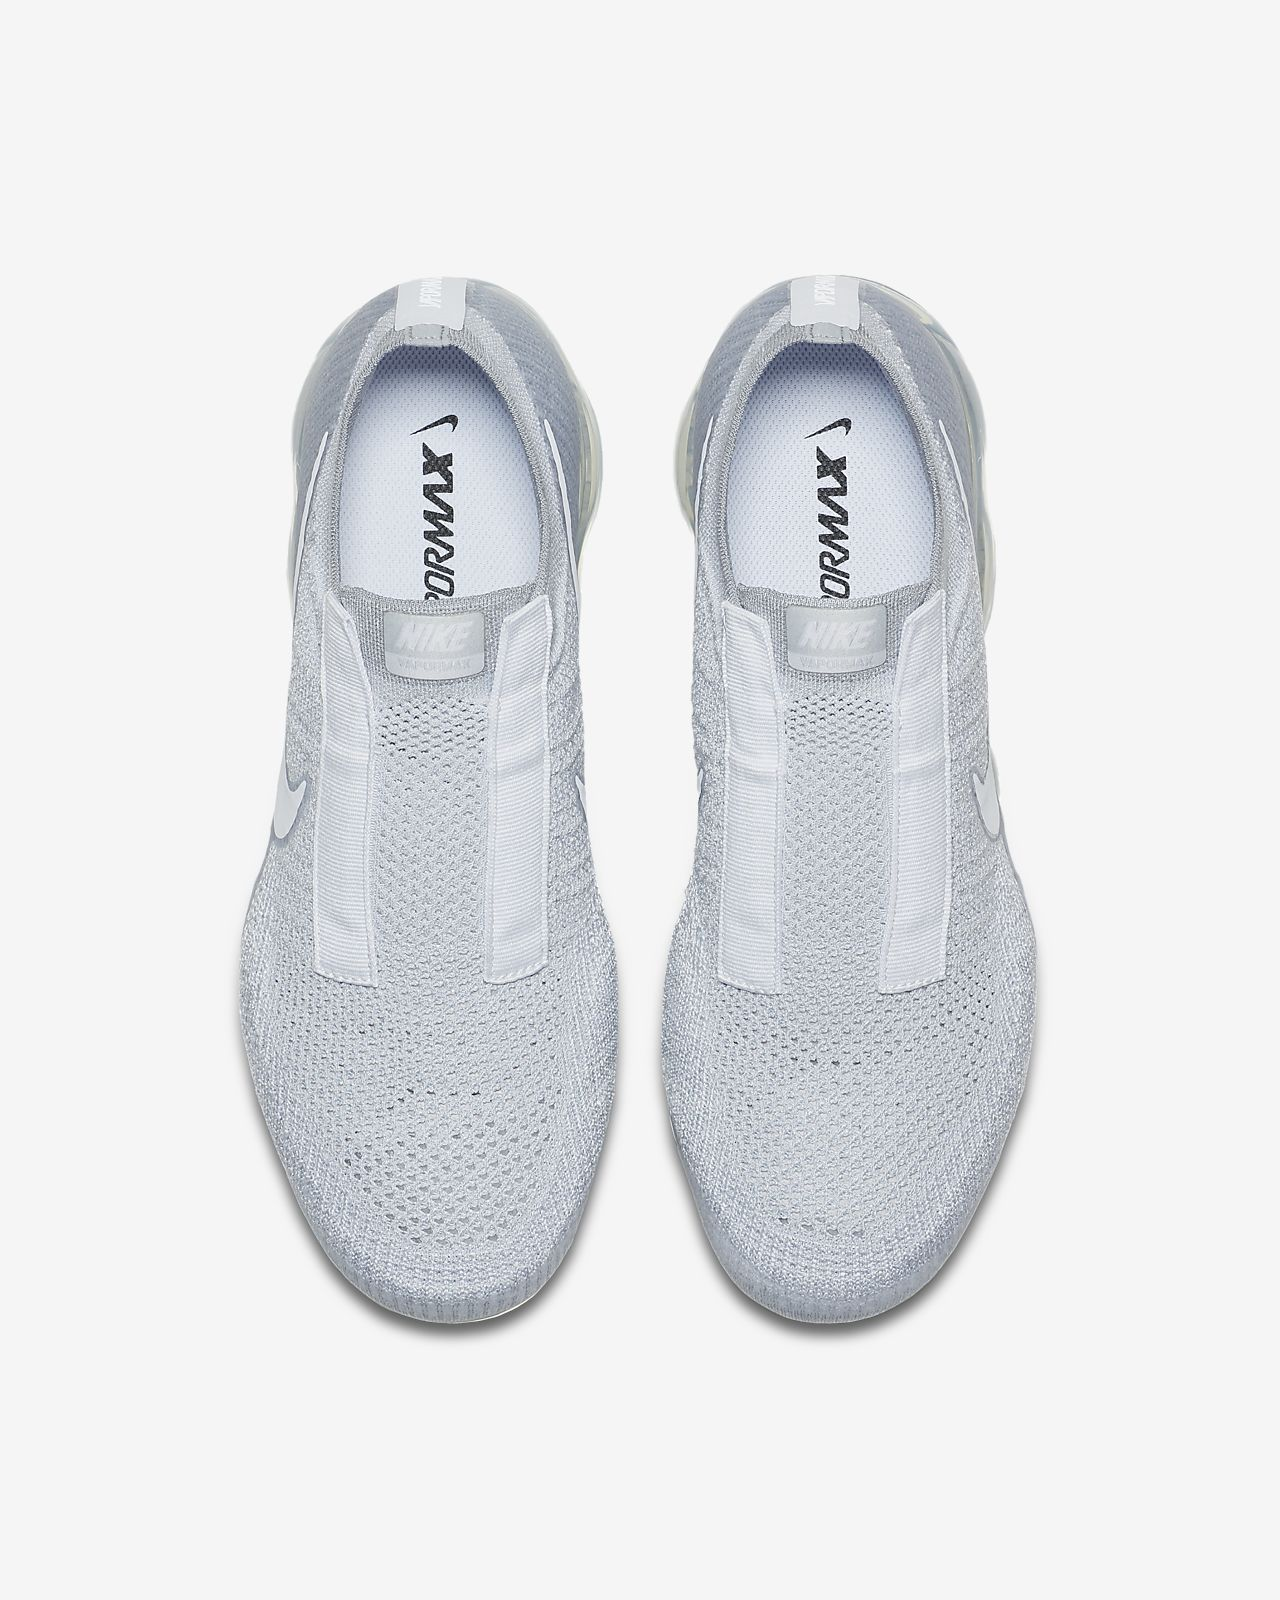 47a496dda6e Nike Air VaporMax Flyknit SE Unisex Running Shoe